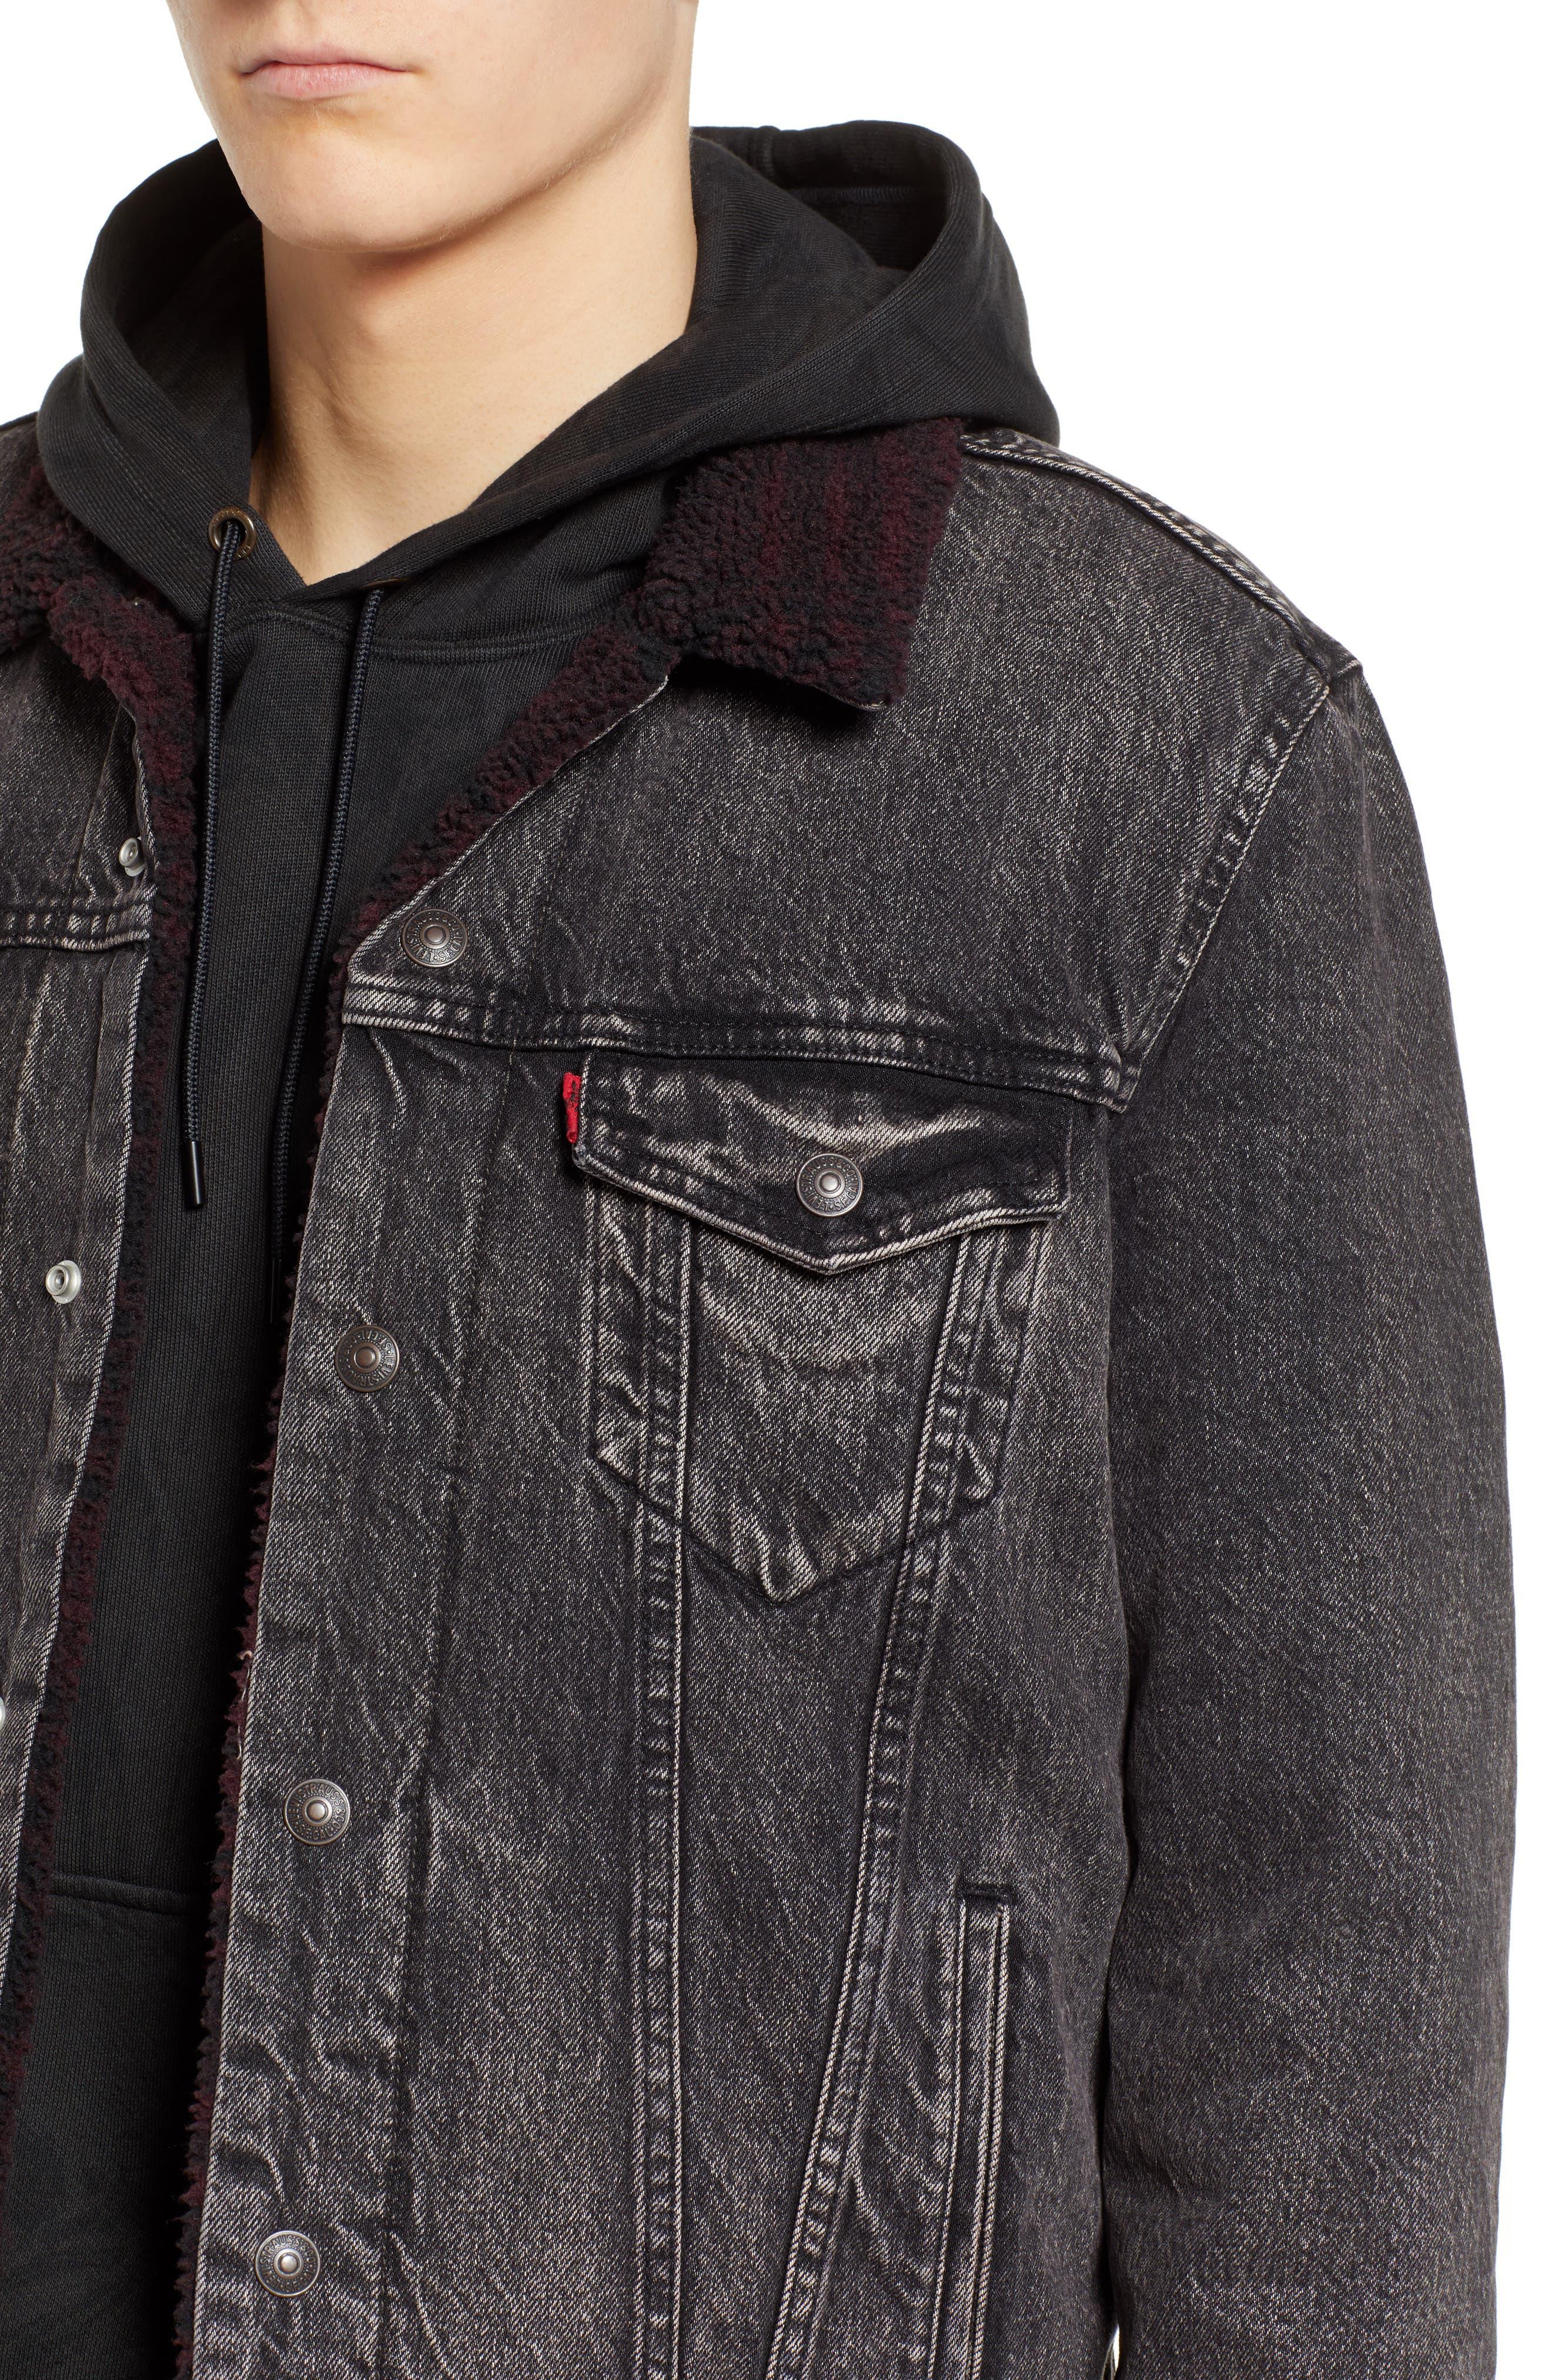 x Justin Timberlake Faux Shearling Collar Trucker Jacket,                             Alternate thumbnail 6, color,                             BRUSTED